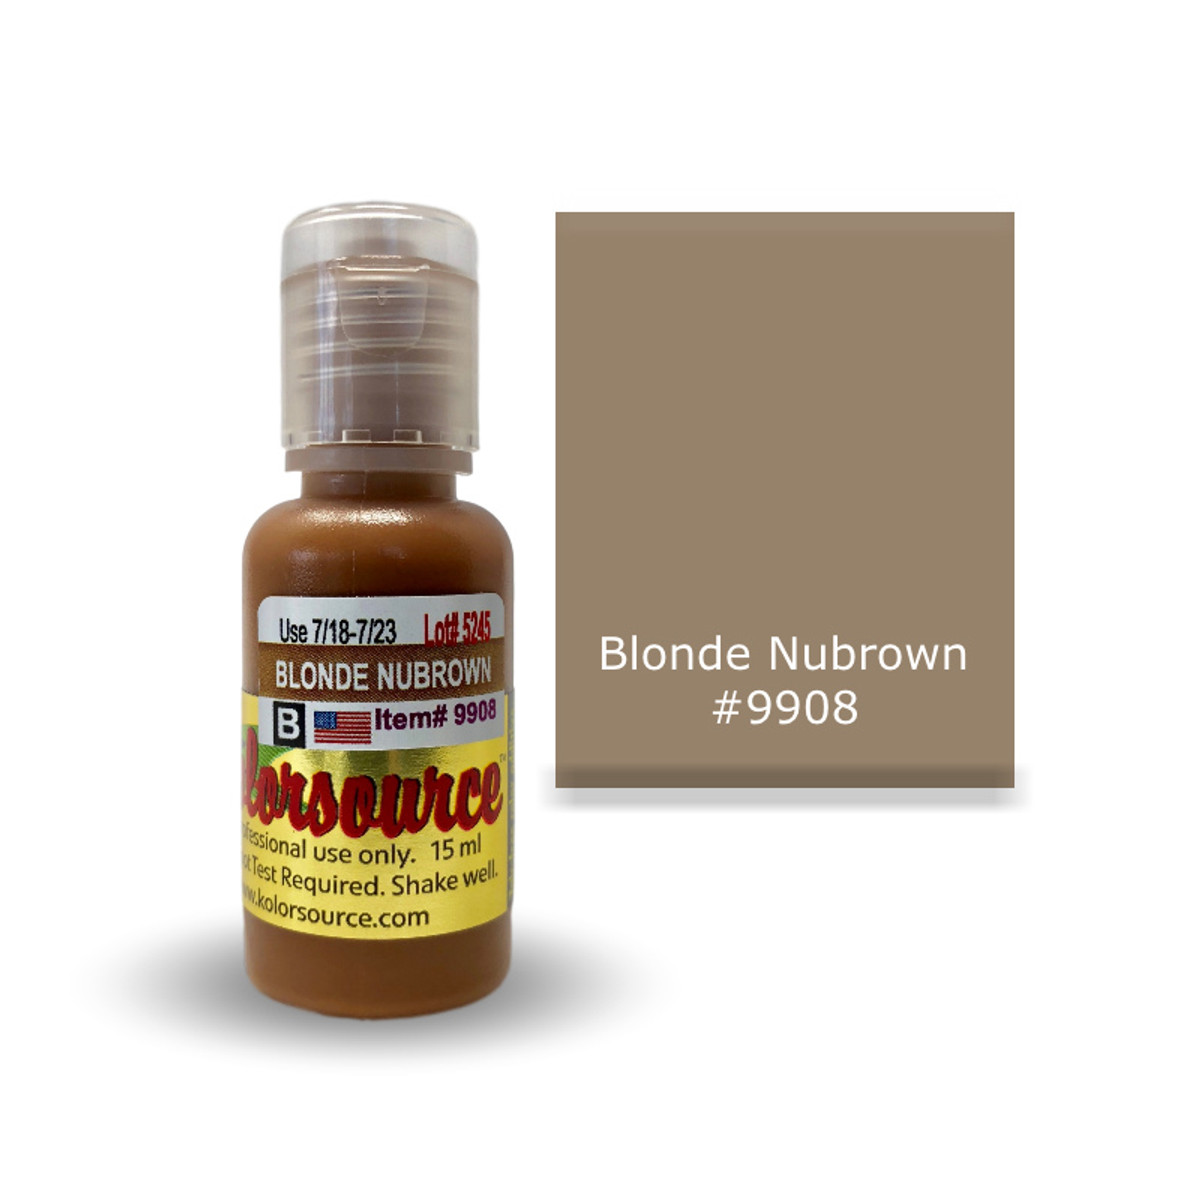 Kolorsource Permanent Makeup Pigment (PMU) Blonde Nubrown #9908 - 15ml